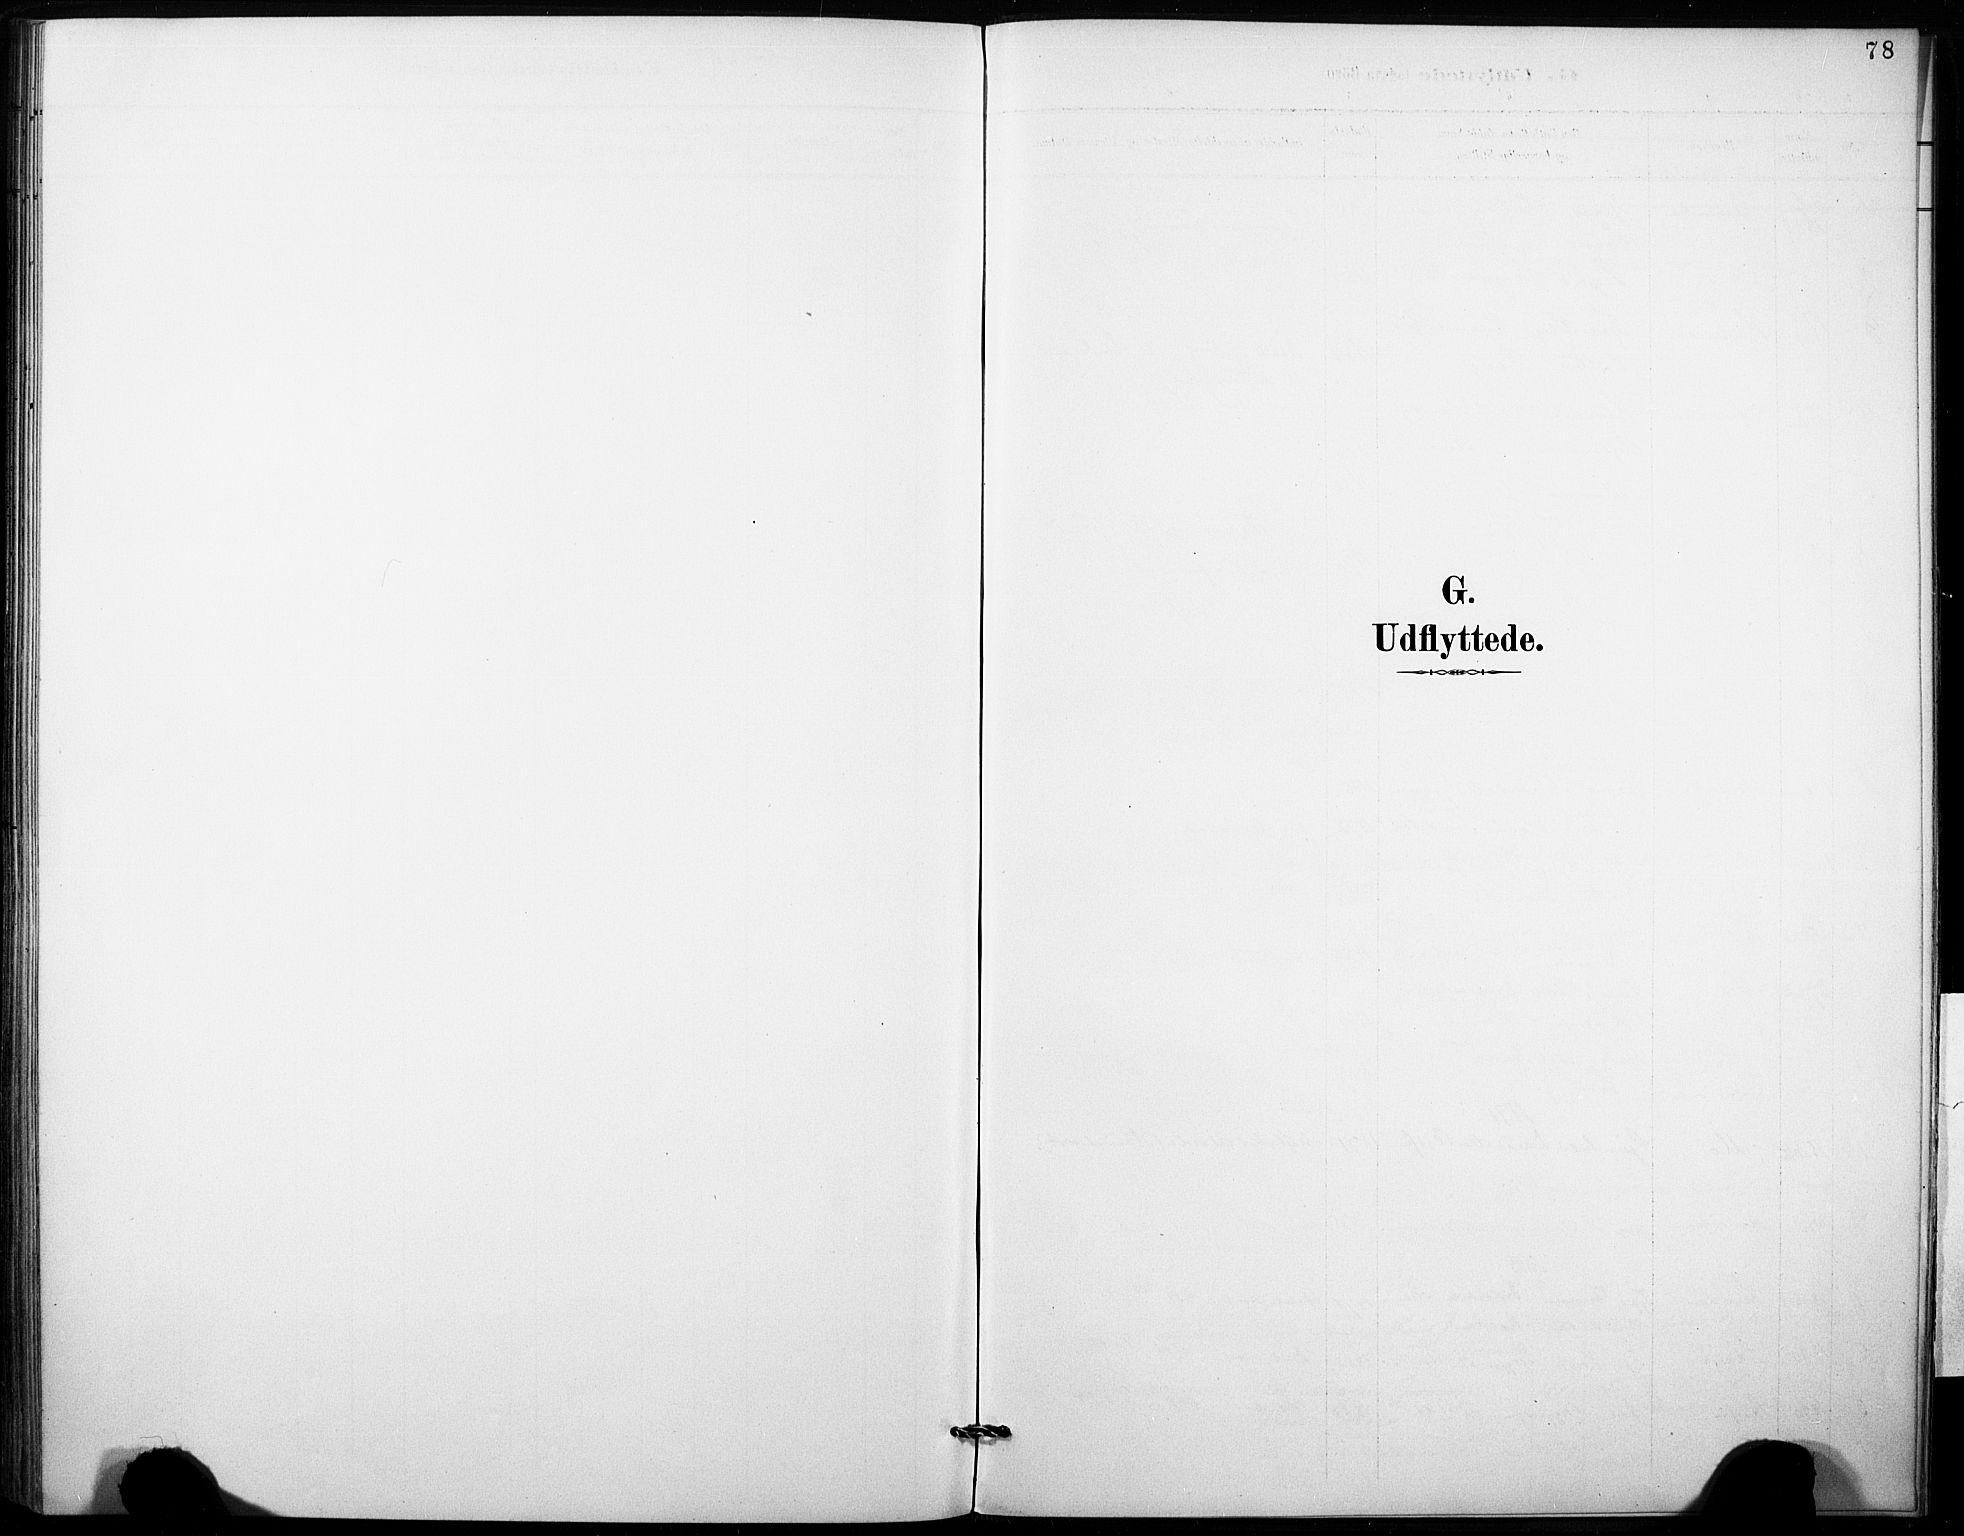 SAKO, Fyresdal kirkebøker, F/Fb/L0003: Parish register (official) no. II 3, 1887-1903, p. 78